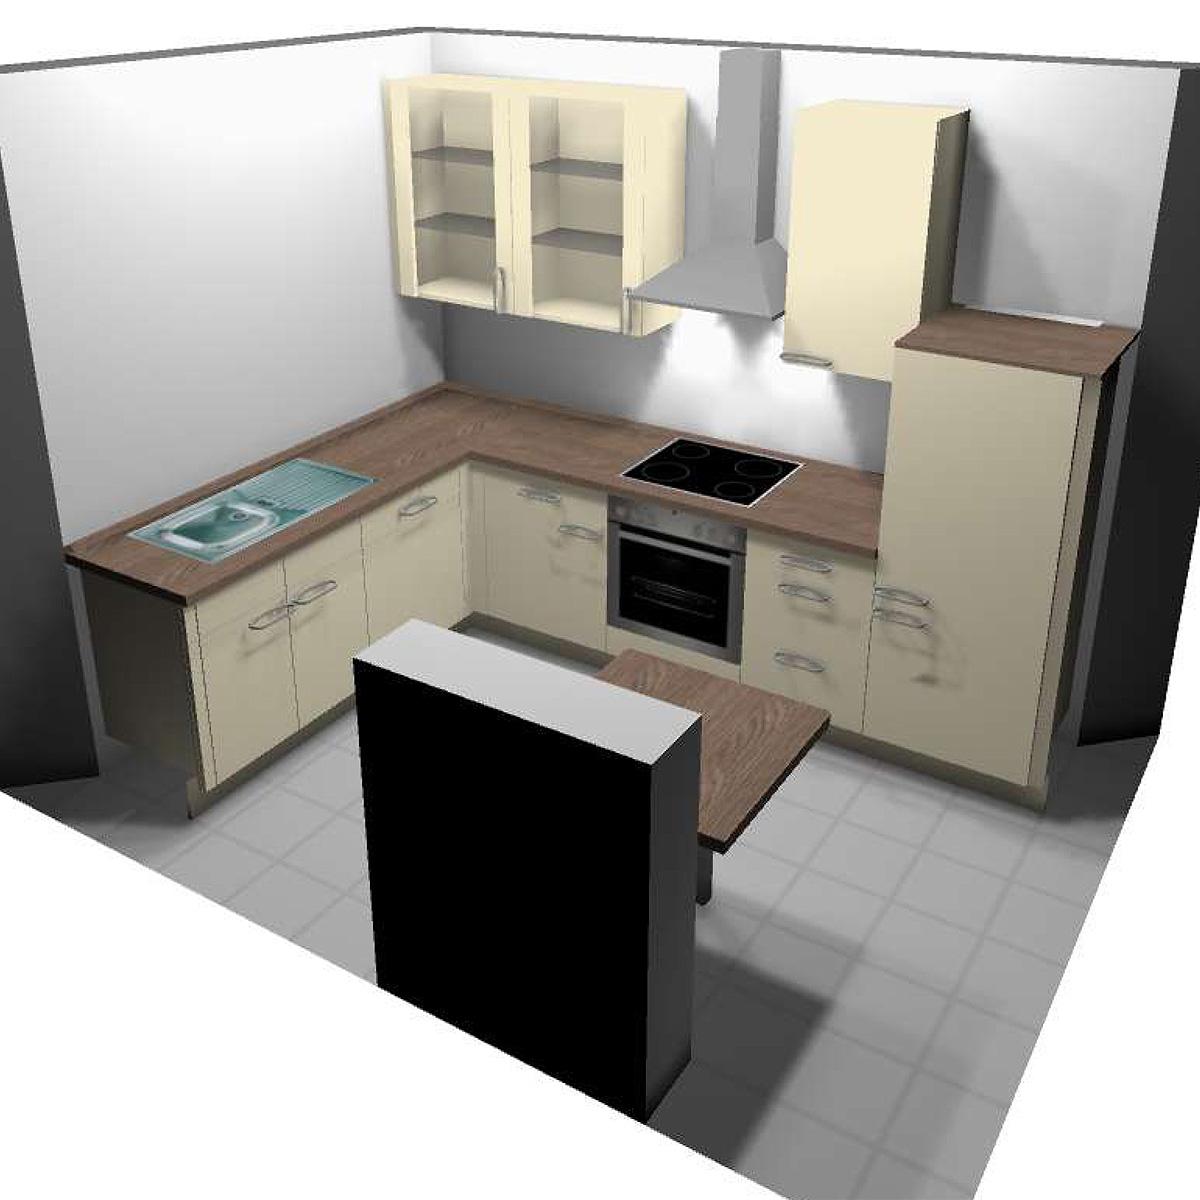 einbauk che l form. Black Bedroom Furniture Sets. Home Design Ideas